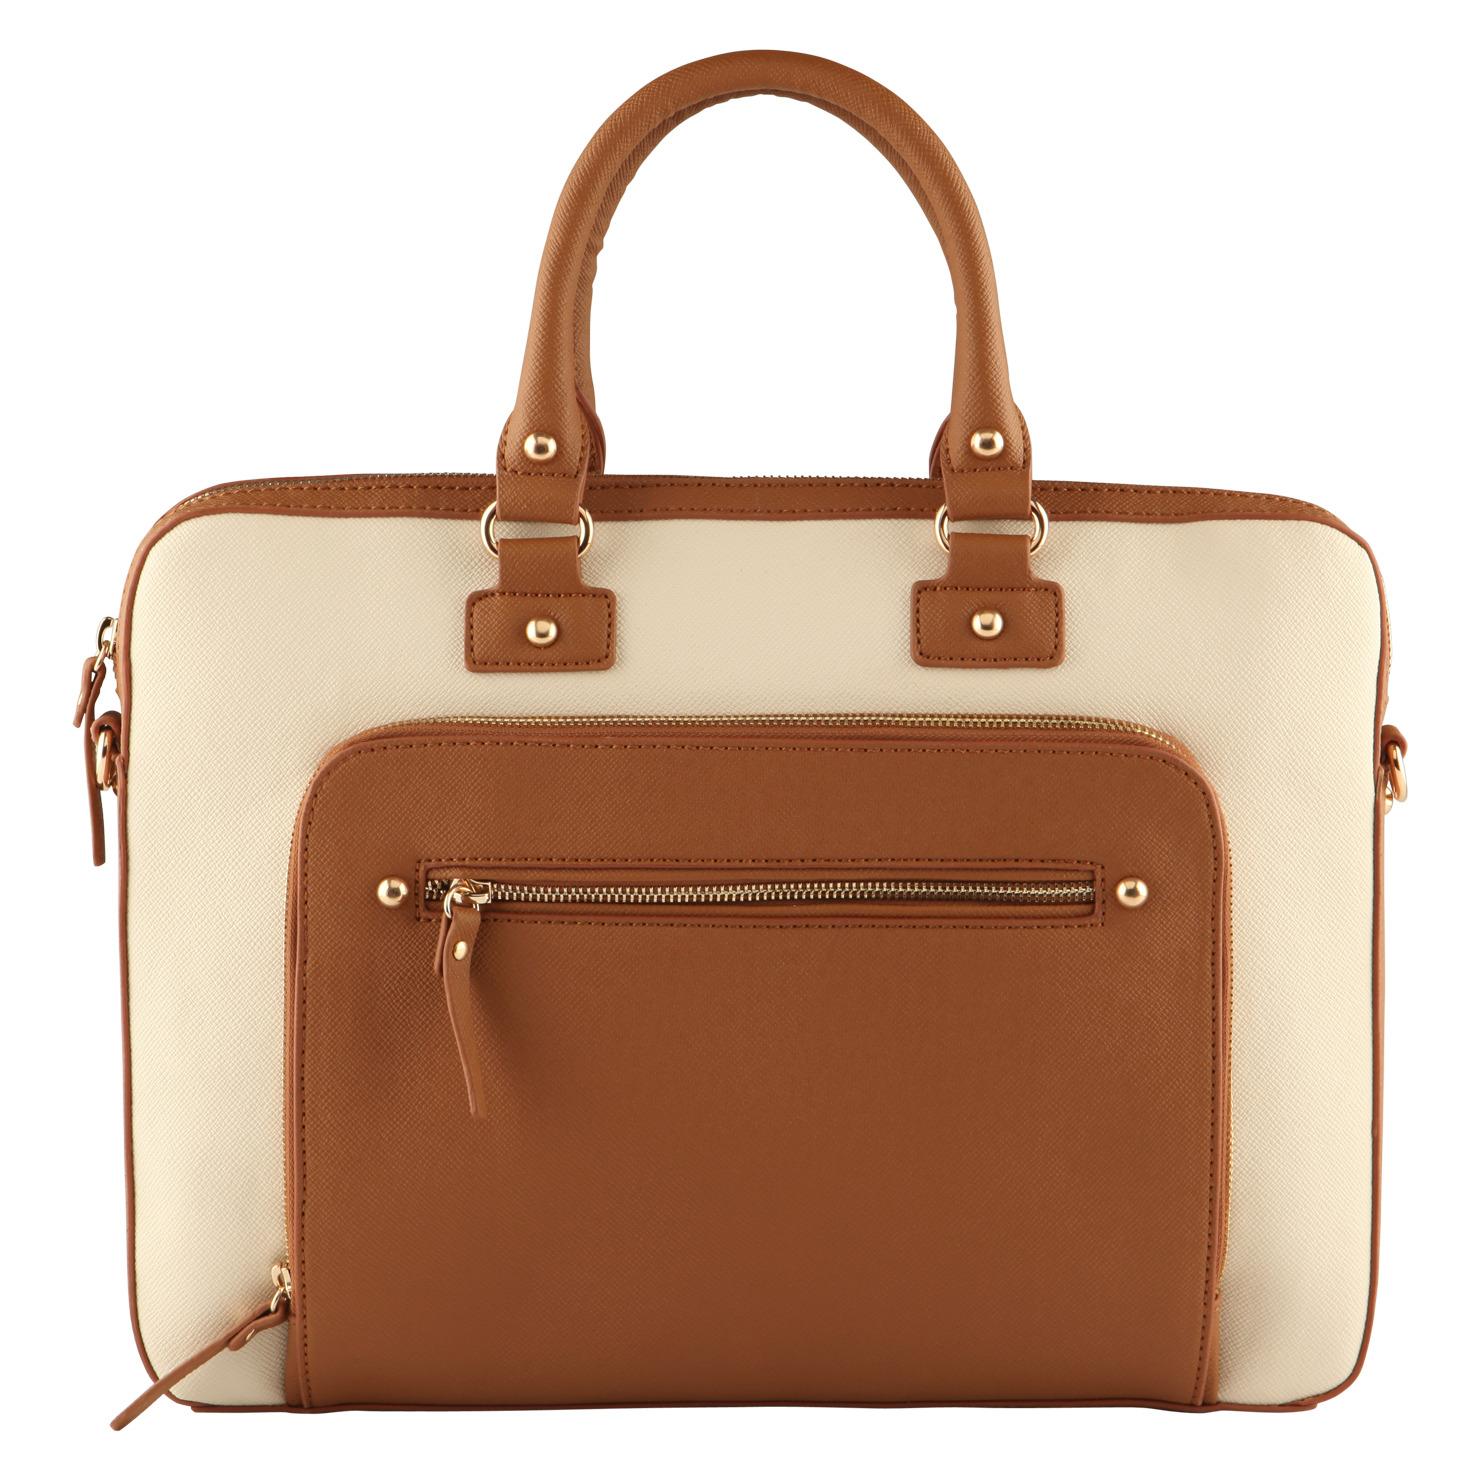 Aldo Montefortino - Laptop Bags